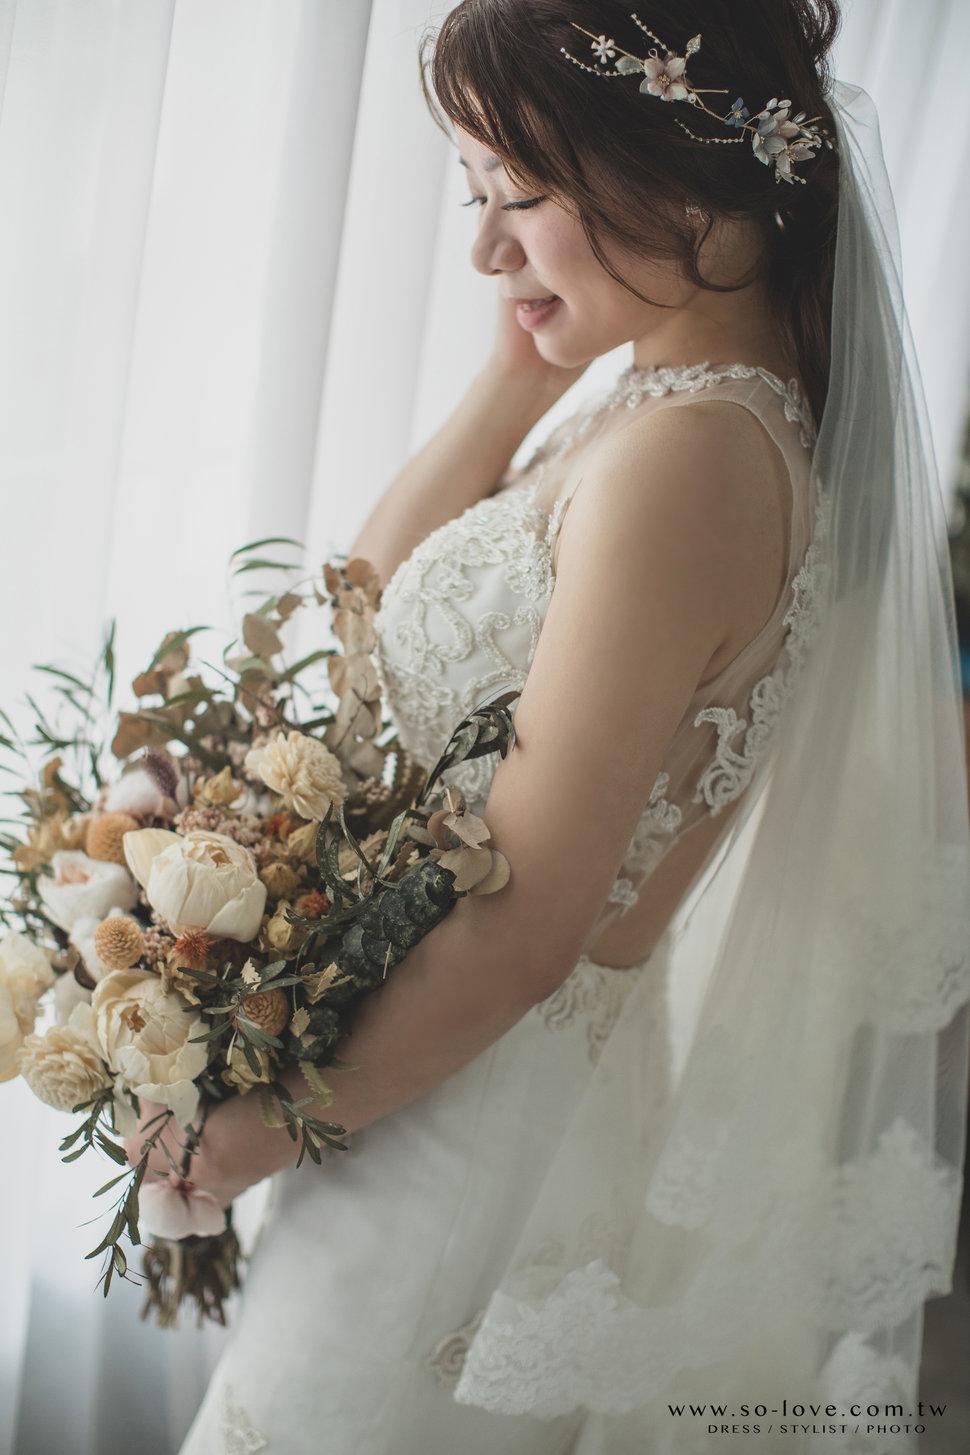 RYAN8164 - So.Love Wedding 樂樂蕾絲《結婚吧》